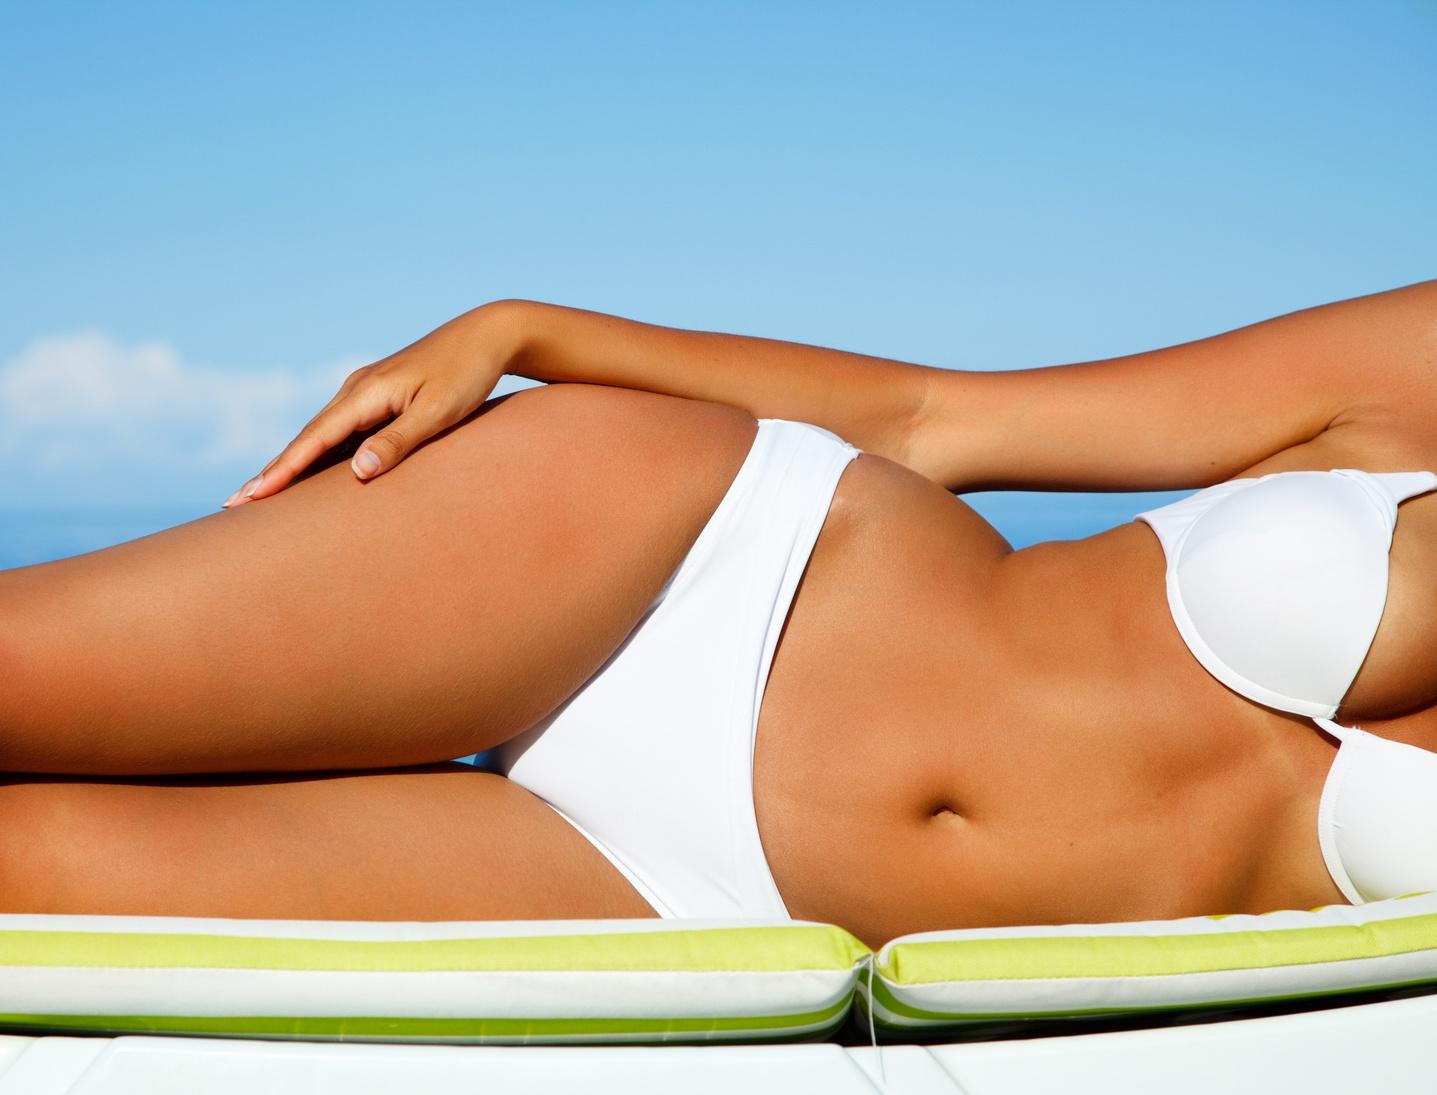 18 Powerful Secrets For A Bikini Ready Body